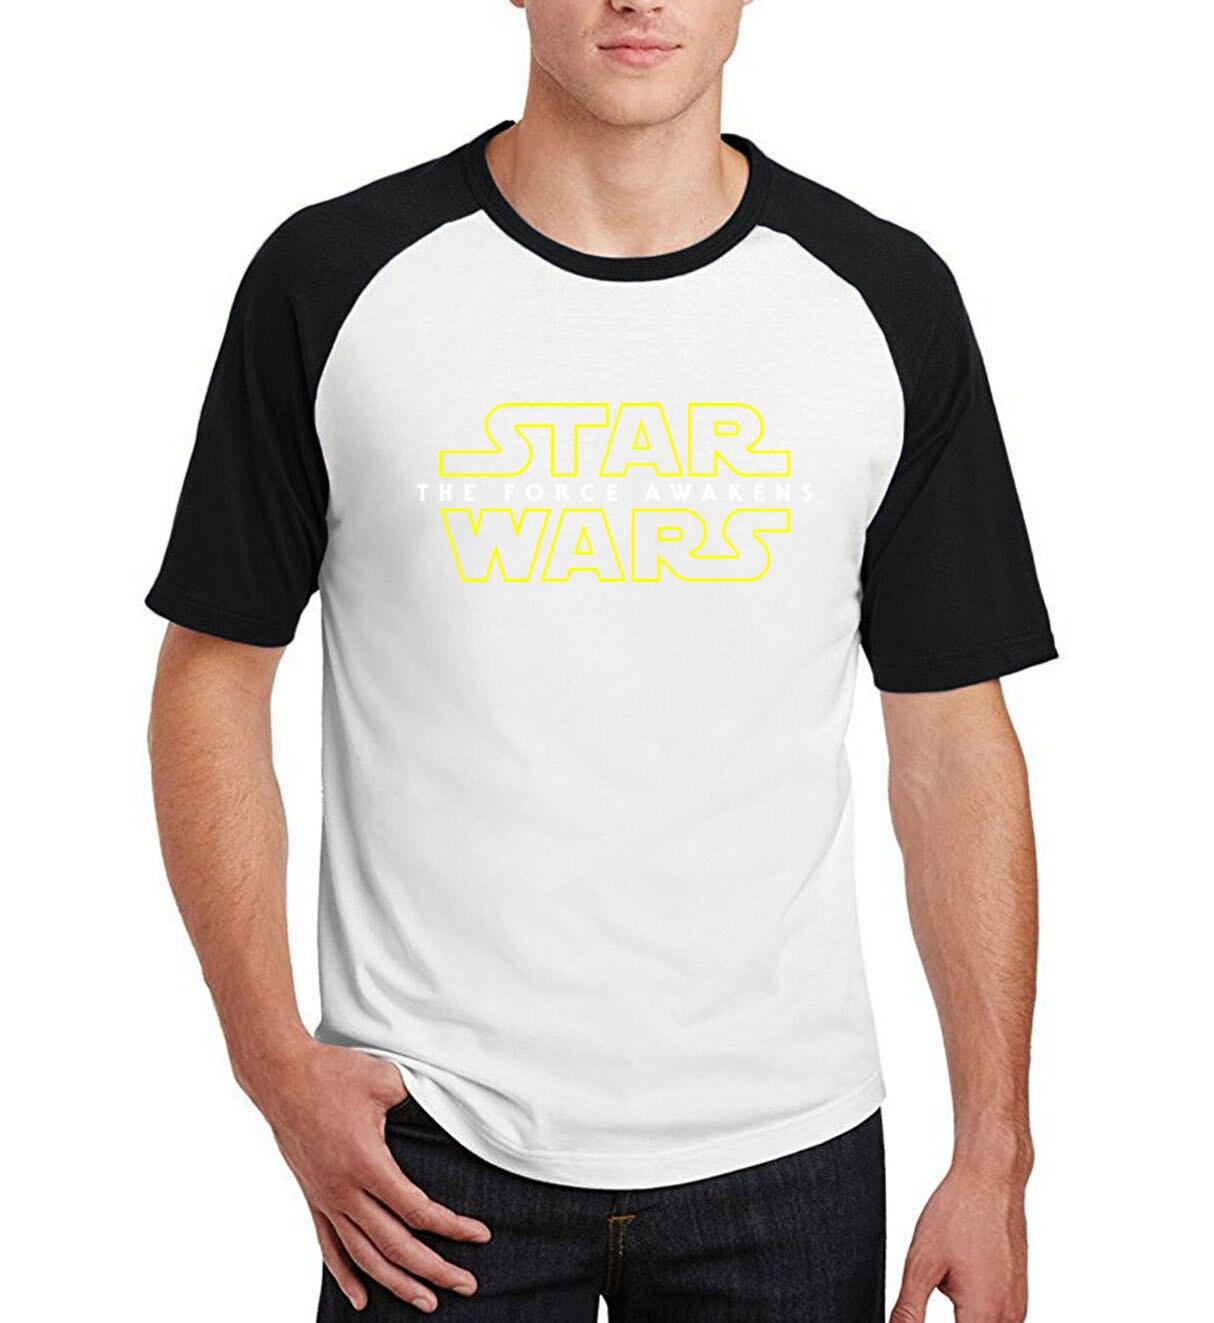 2019 summer raglan hip-hop mma camisetas star wars  fitness t shirt men cotton casual short sleeve star wars clothing tee shirts